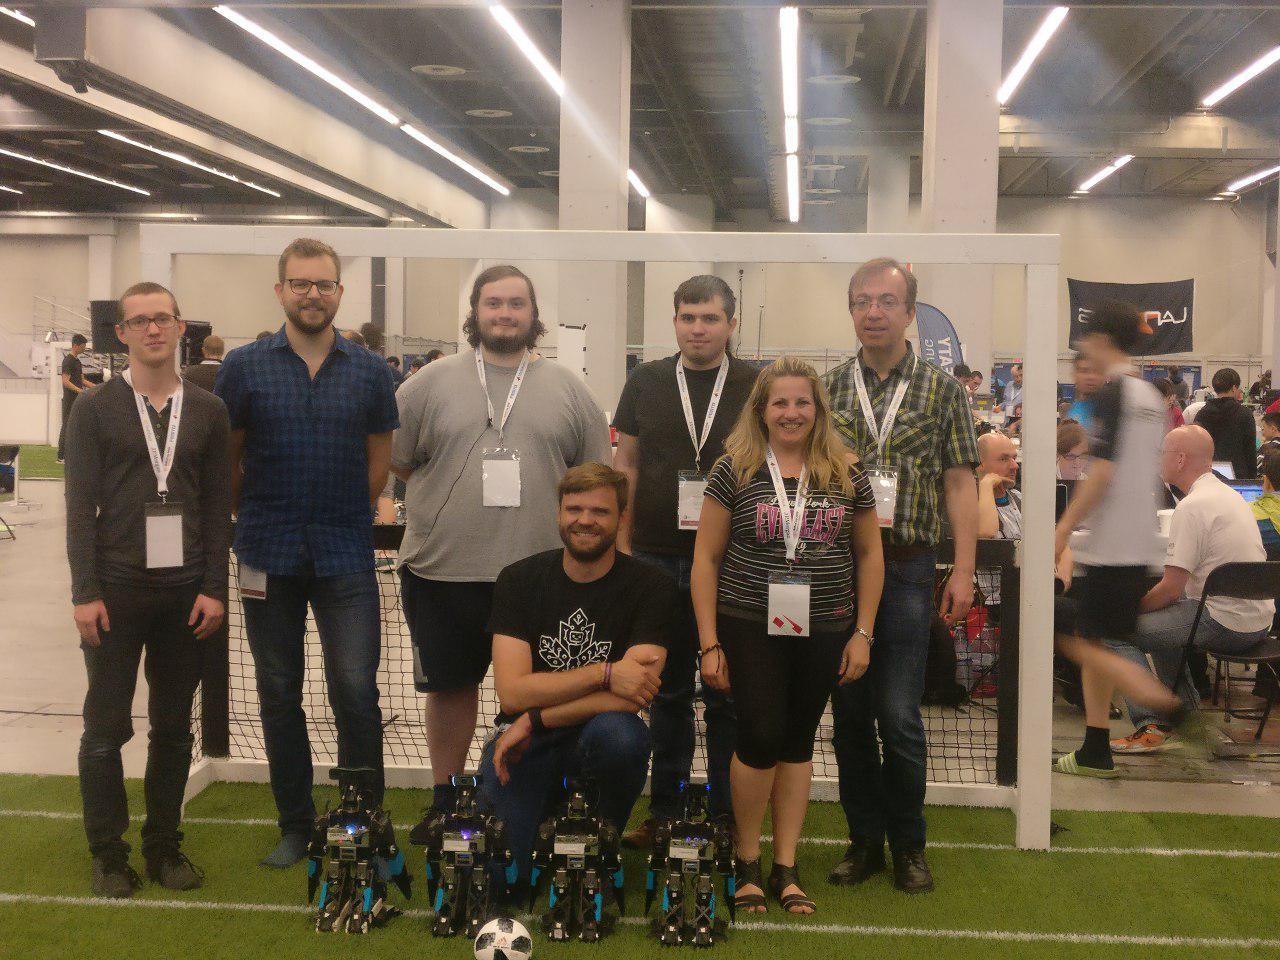 BoldHearts team at the RoboCup 2018 in Montréal / Canada